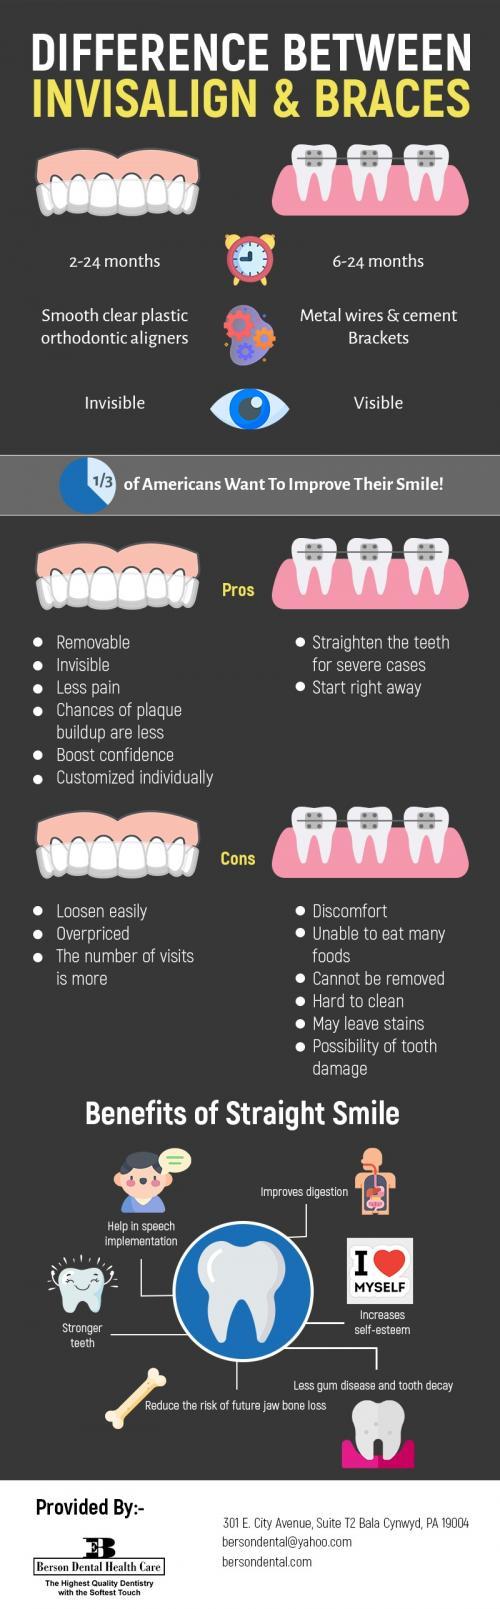 Berson Dental Health Care - Invisalign Specialists in Bala Cynwyd, PA